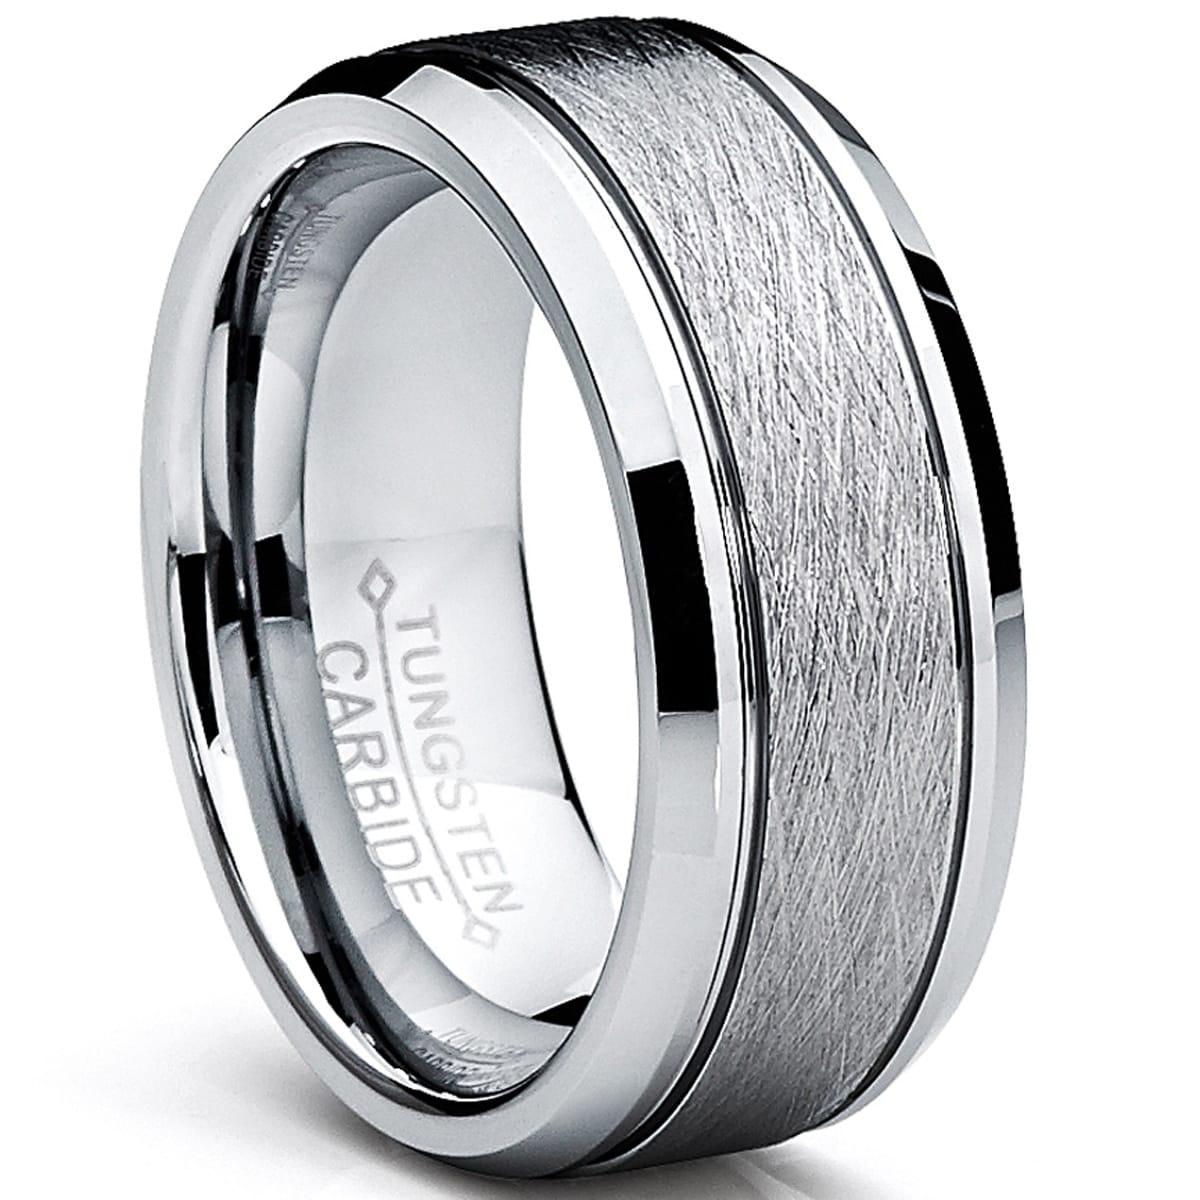 Shop Oliveti Tungsten Carbide Men S Brushed Center Ring Wedding